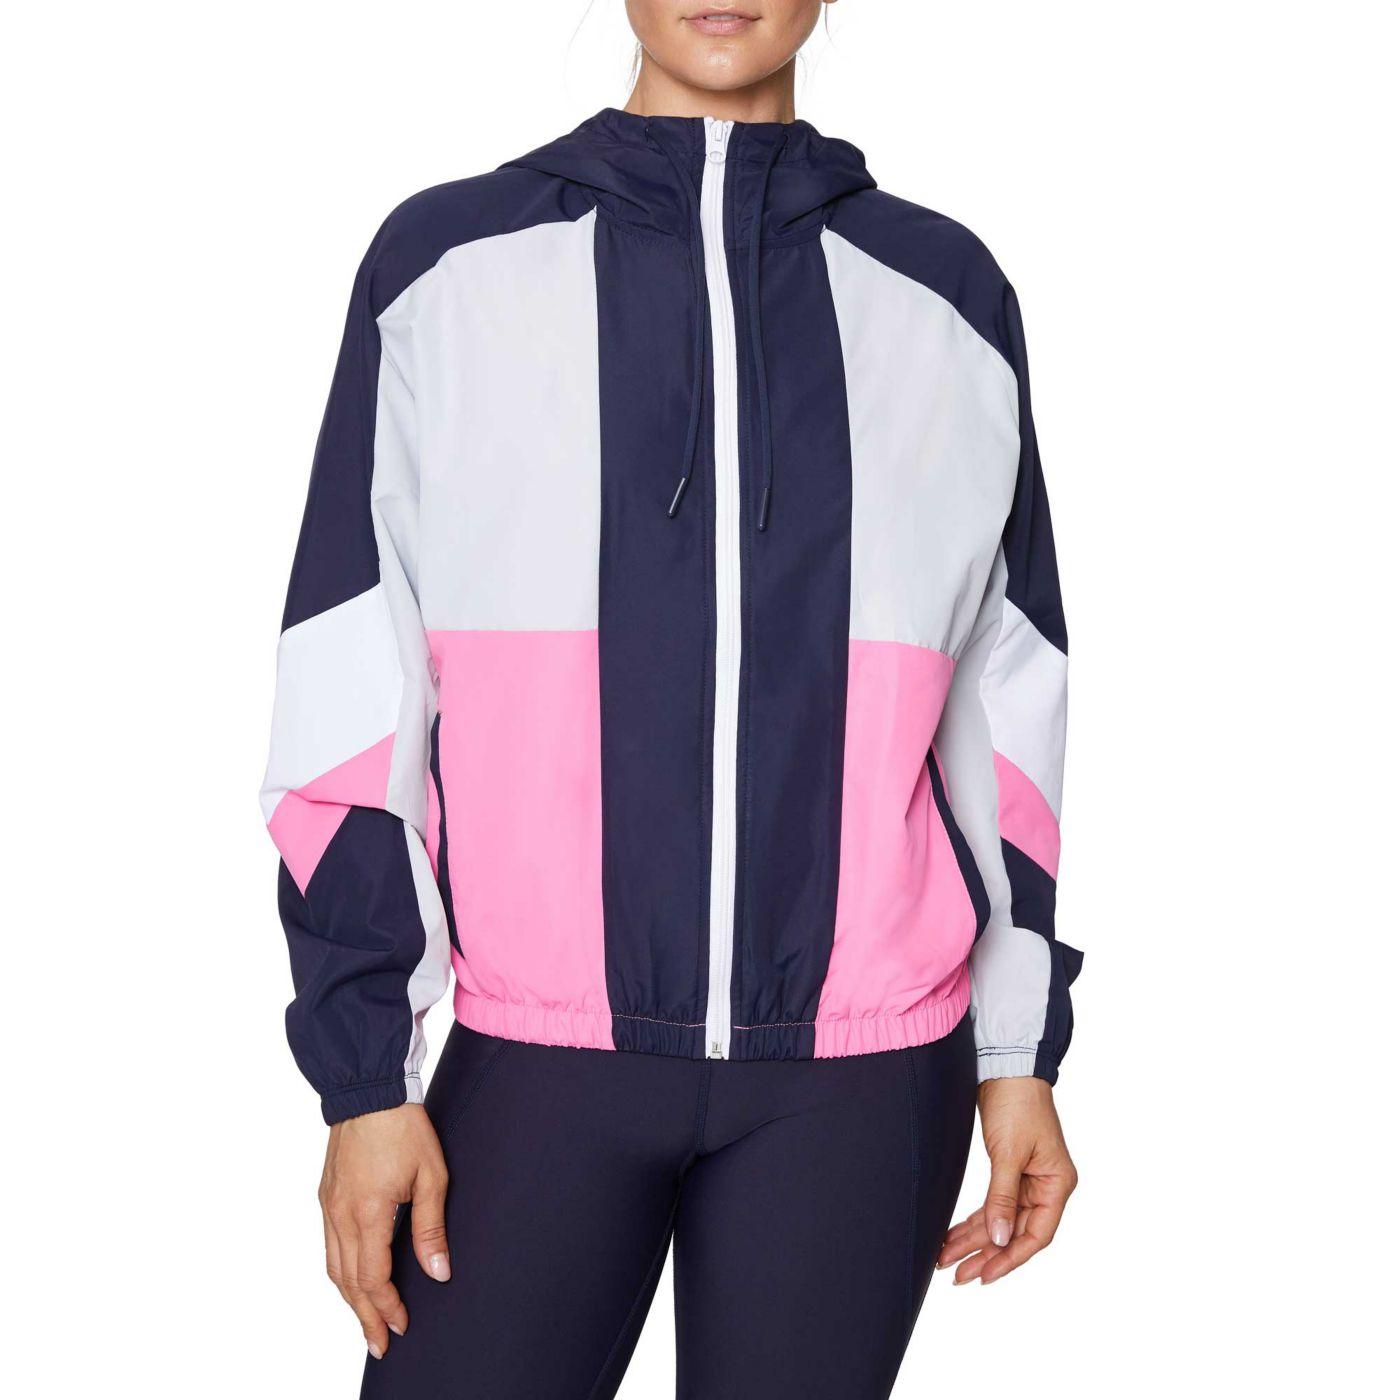 Betsey Johnson Women's Colorblock Woven Jacket